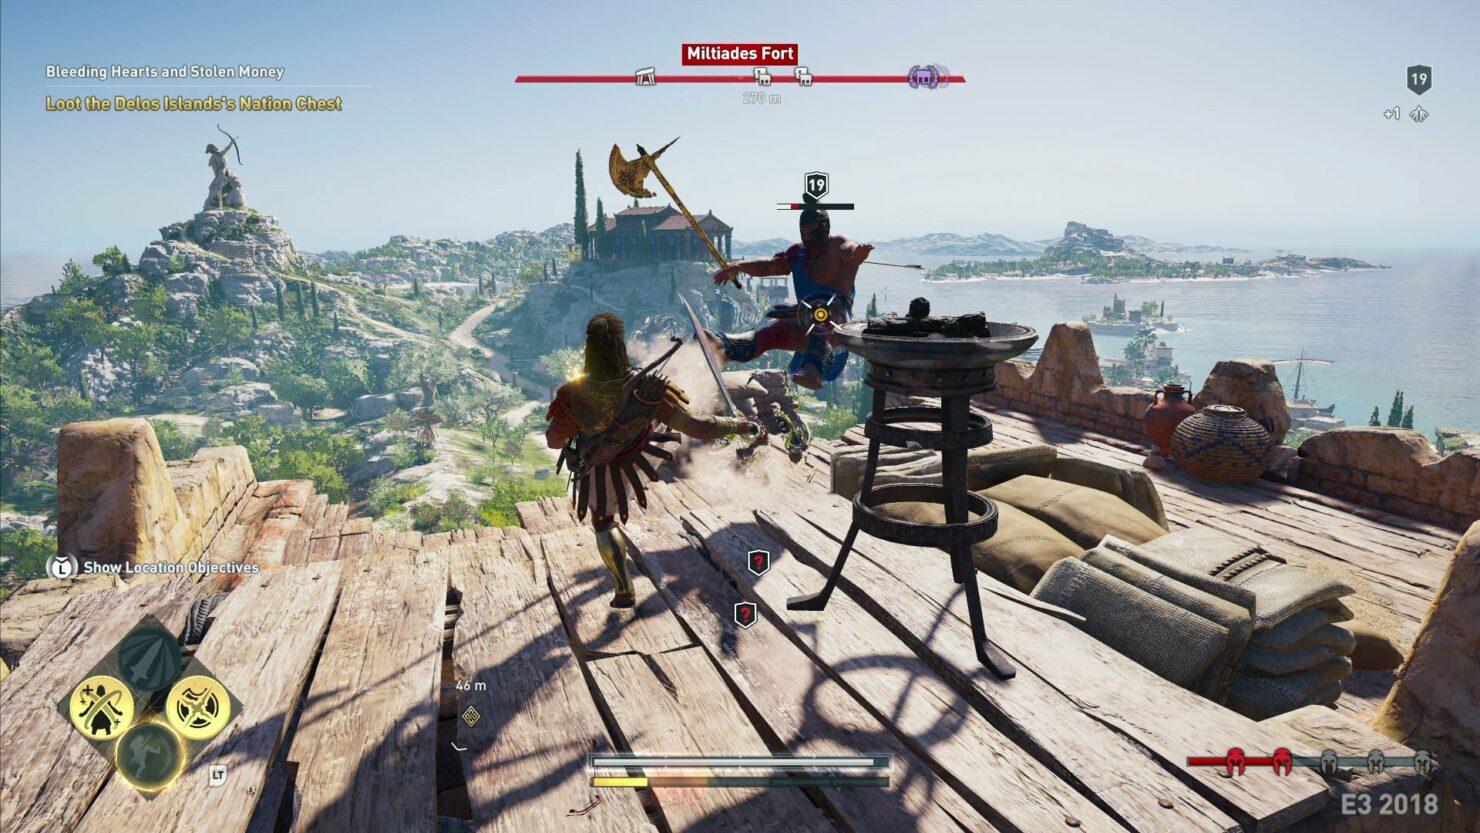 assassins-creed-odyssey-screenshot-leak-screenshot-13